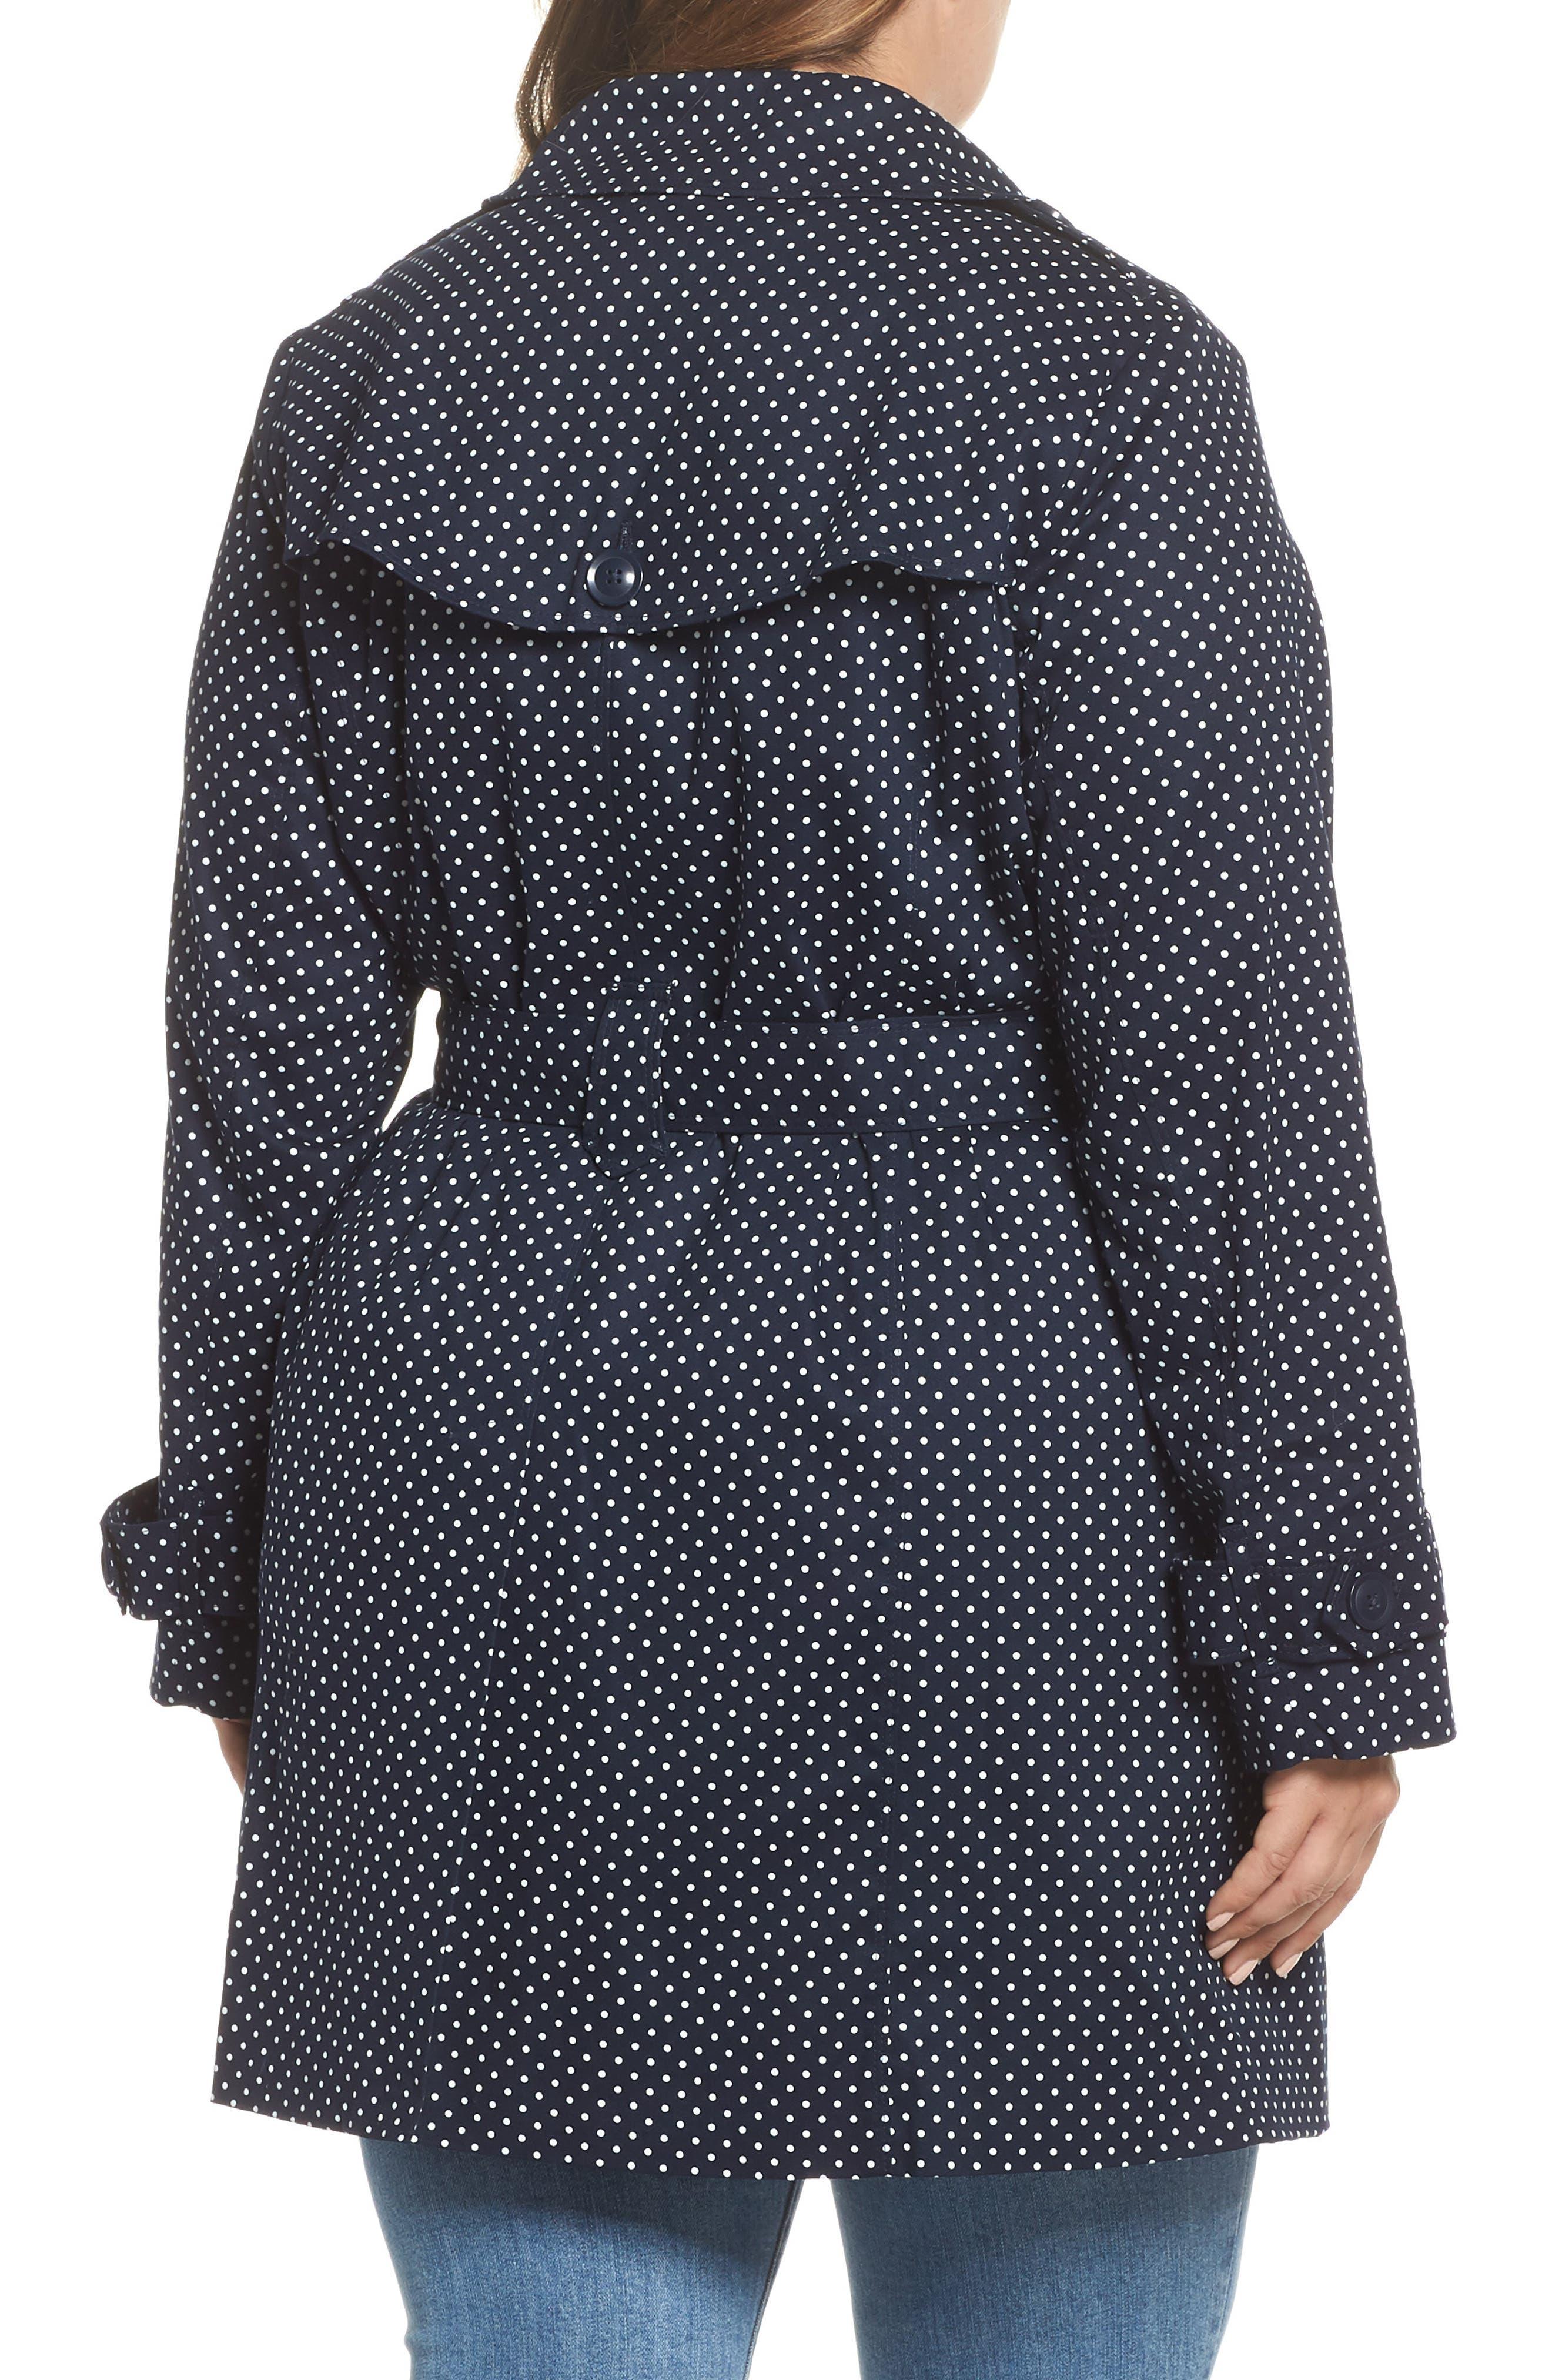 Polka Dot Single Breasted Trench Coat,                             Alternate thumbnail 2, color,                             Navy